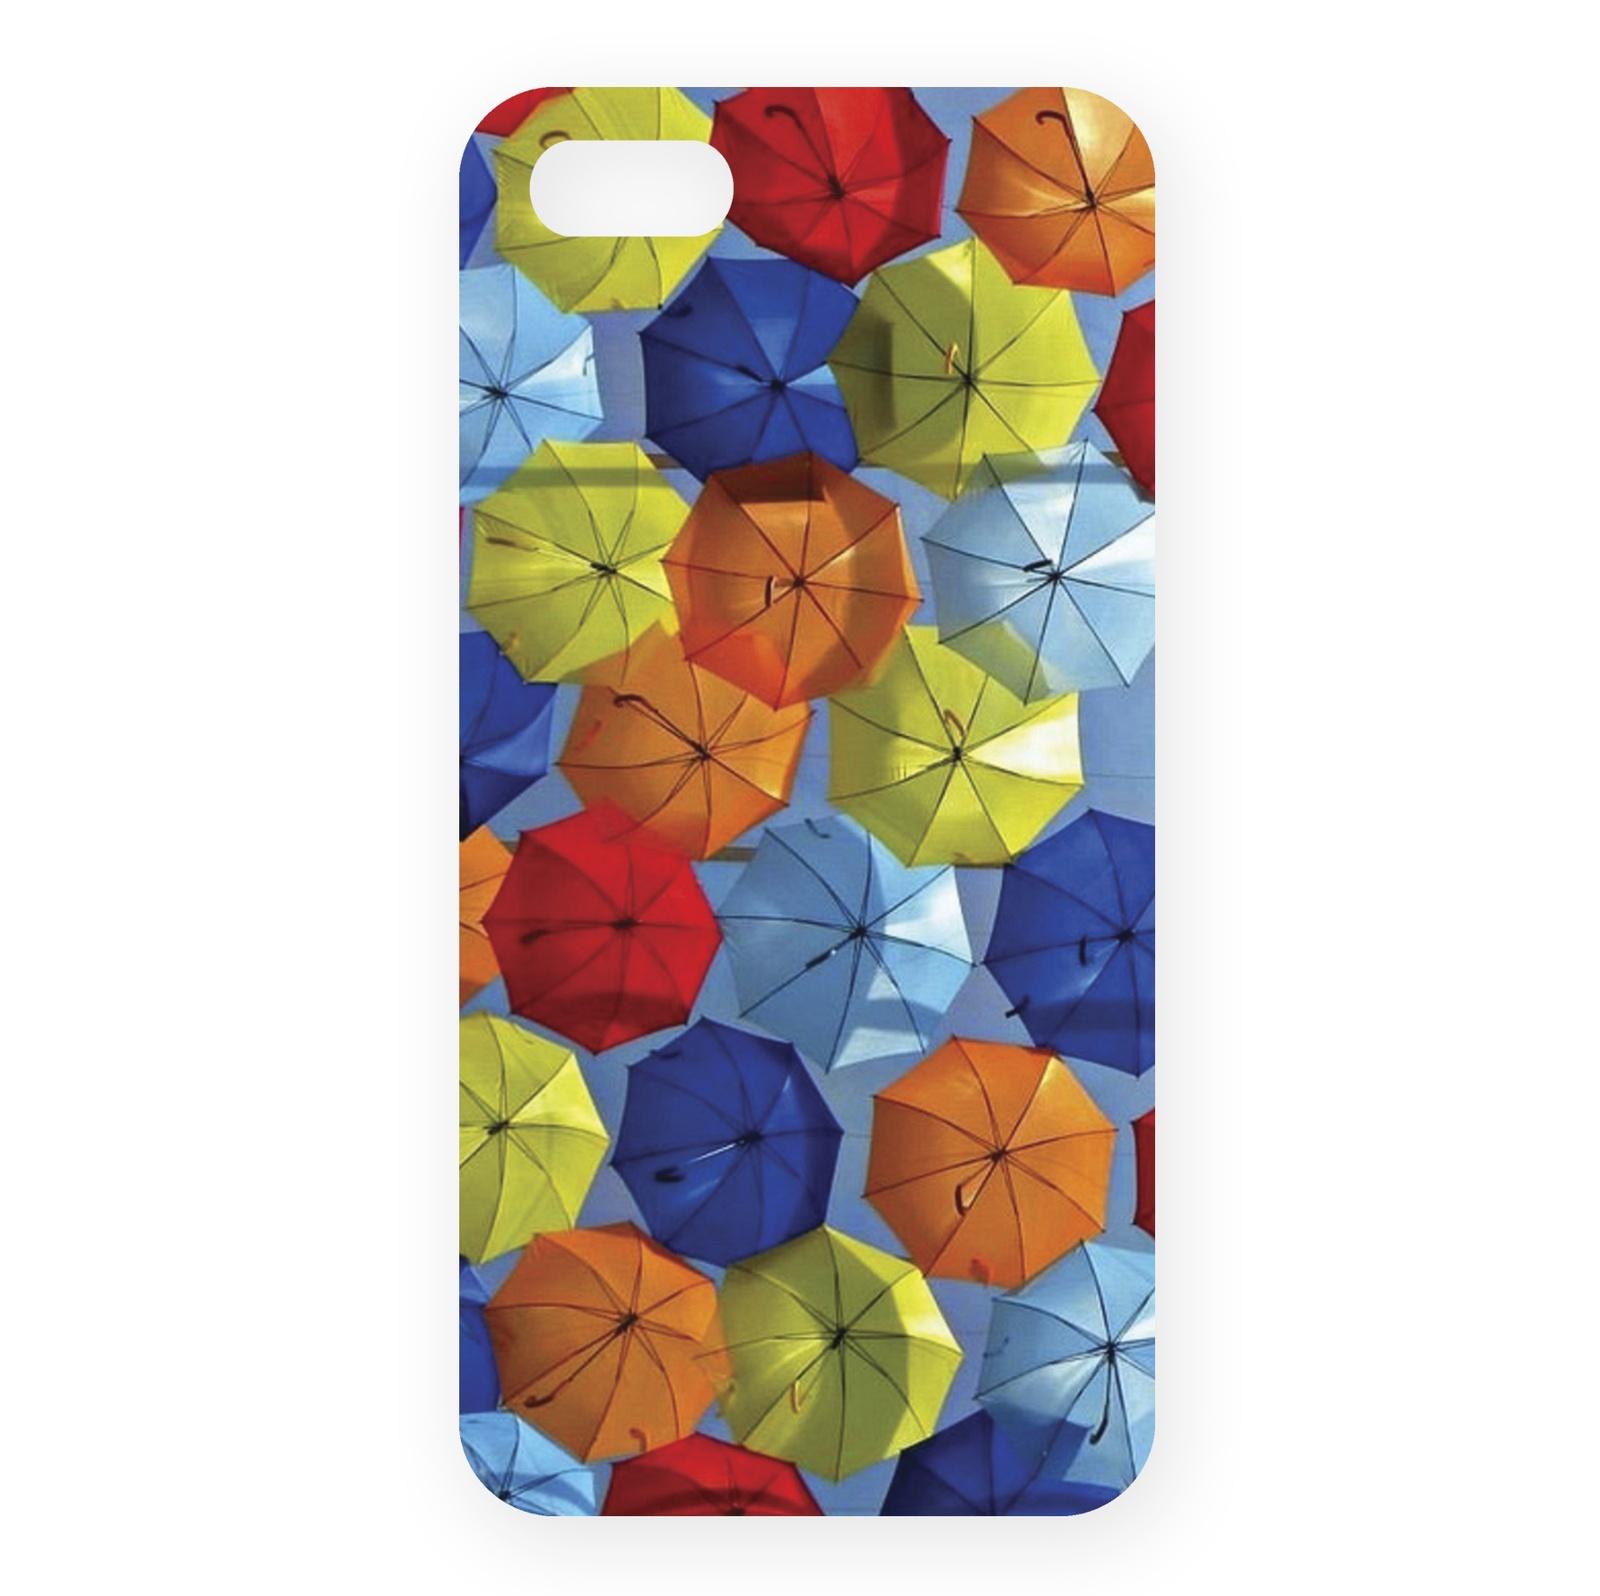 Чехол для IPhone 5 Зонтики IP5.MITYA-226 цена и фото